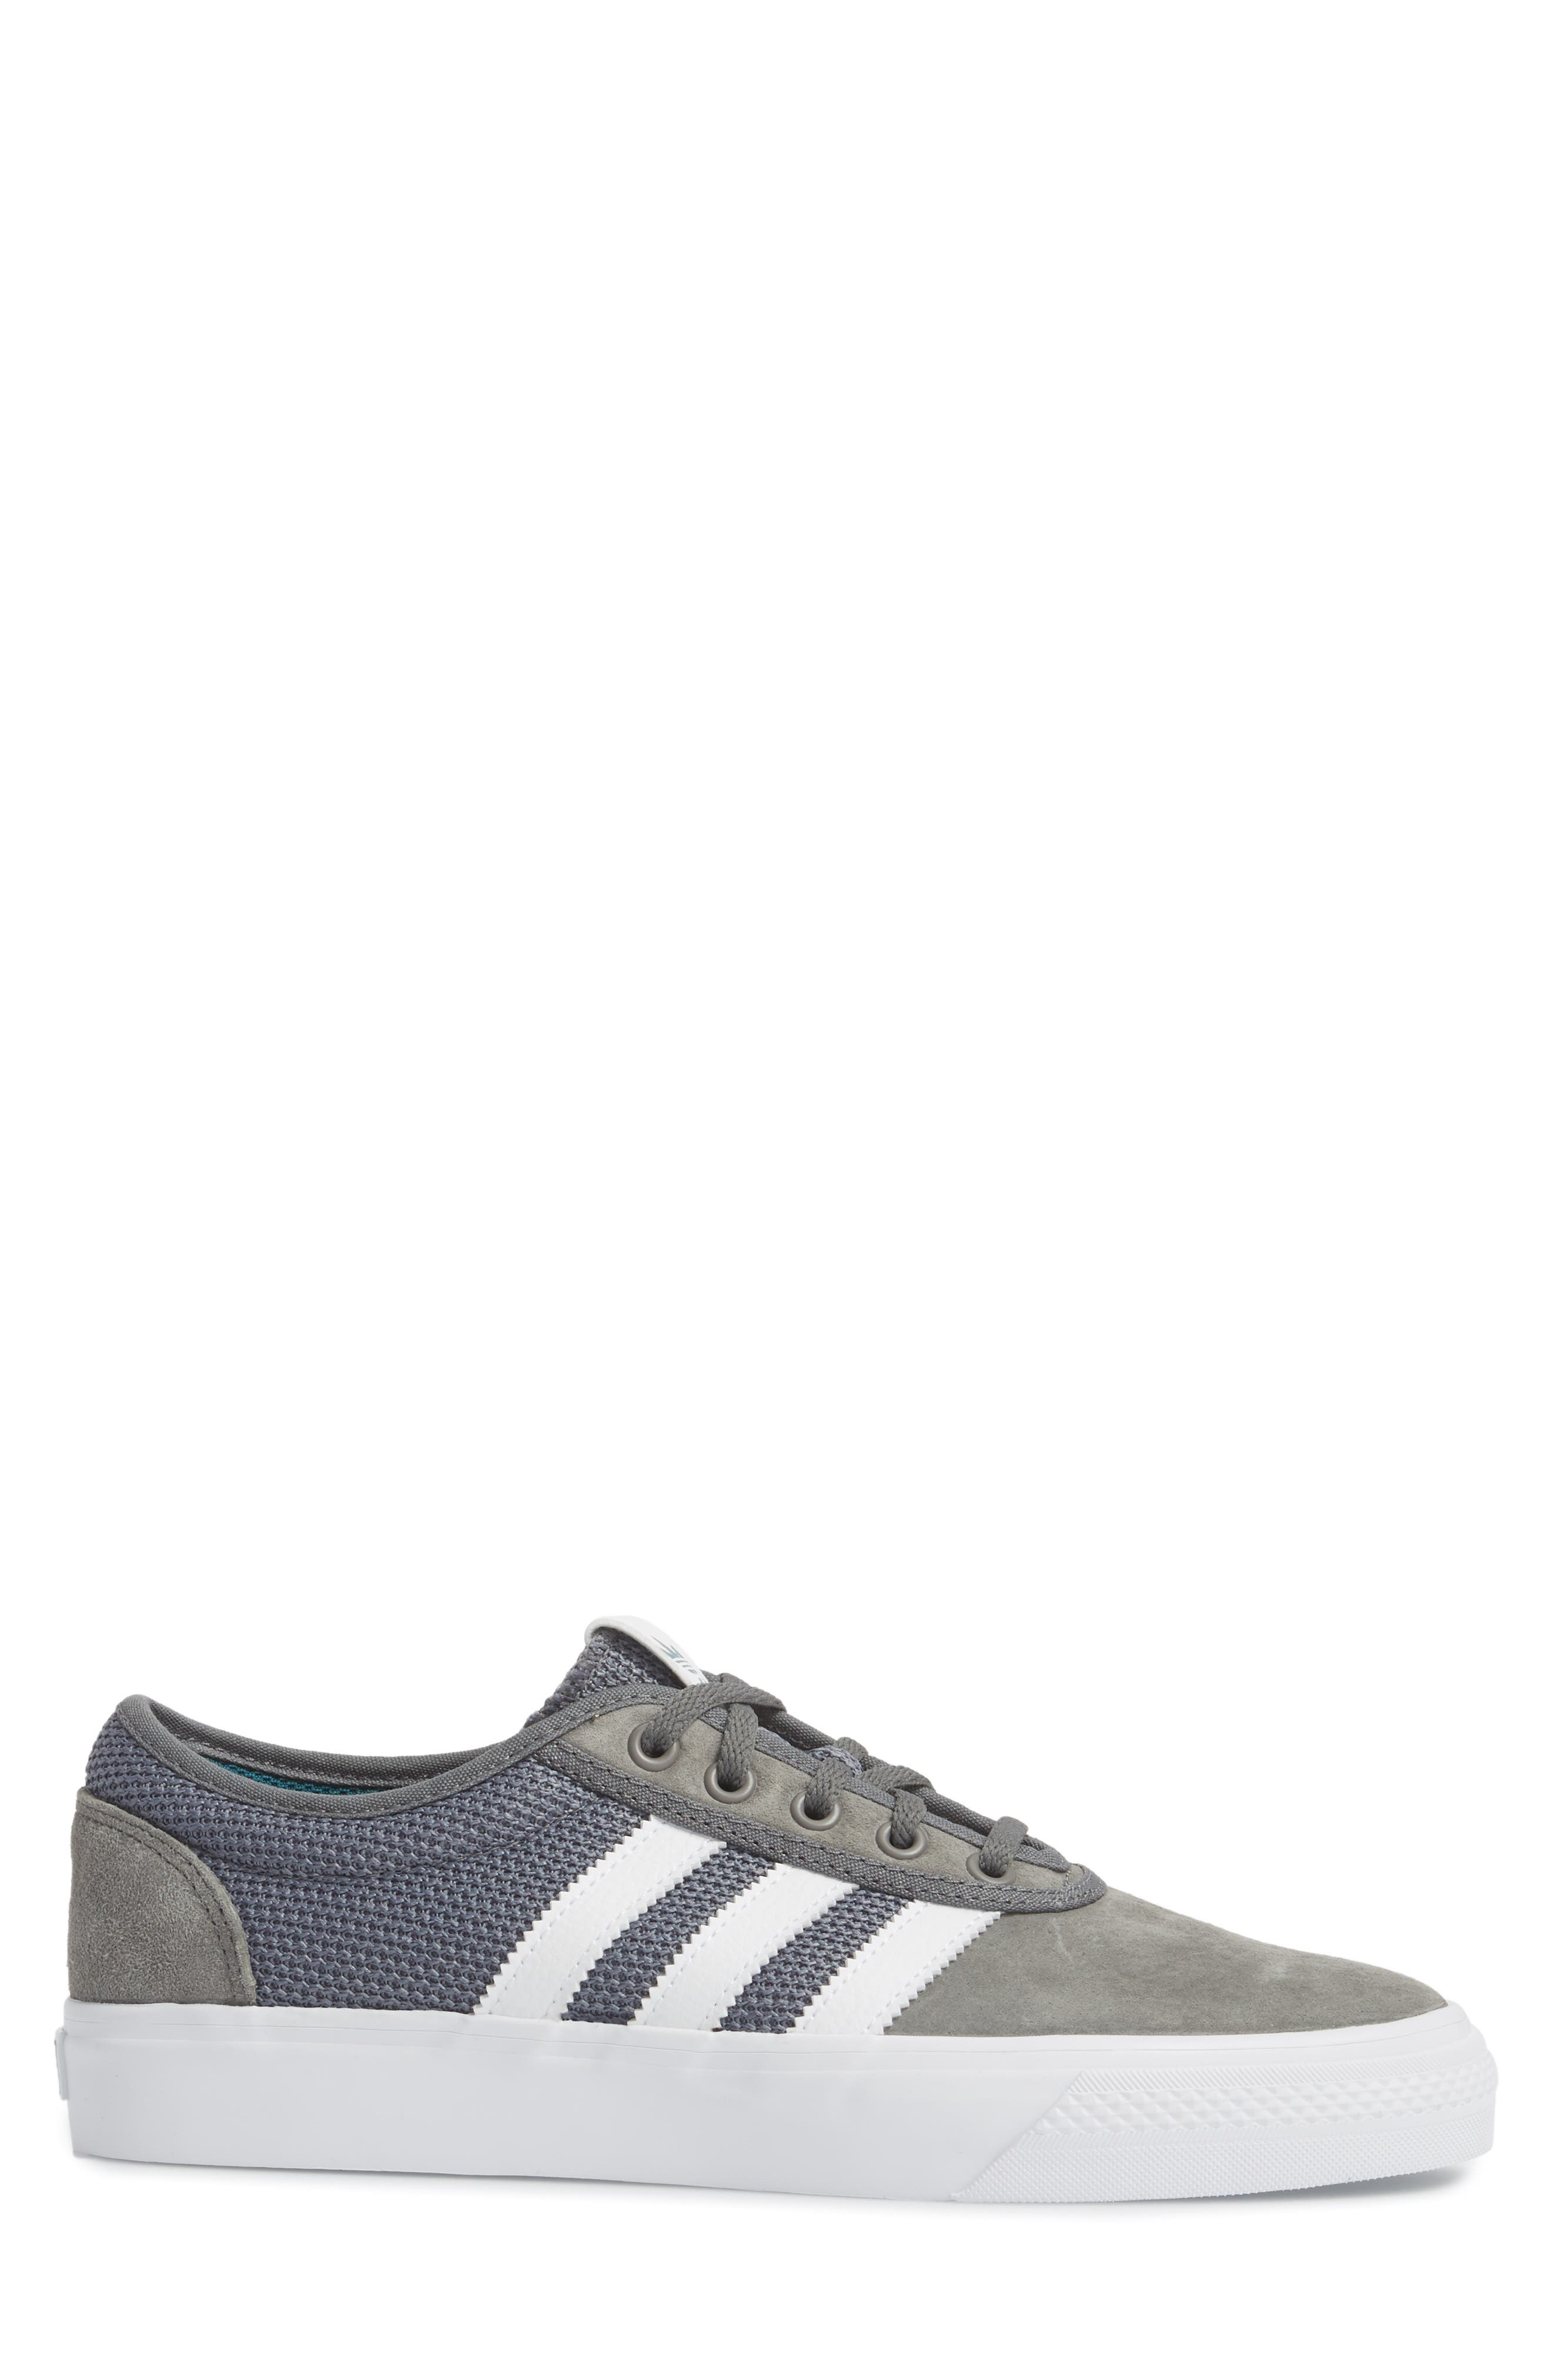 adi-Ease Sneaker,                             Alternate thumbnail 3, color,                             023